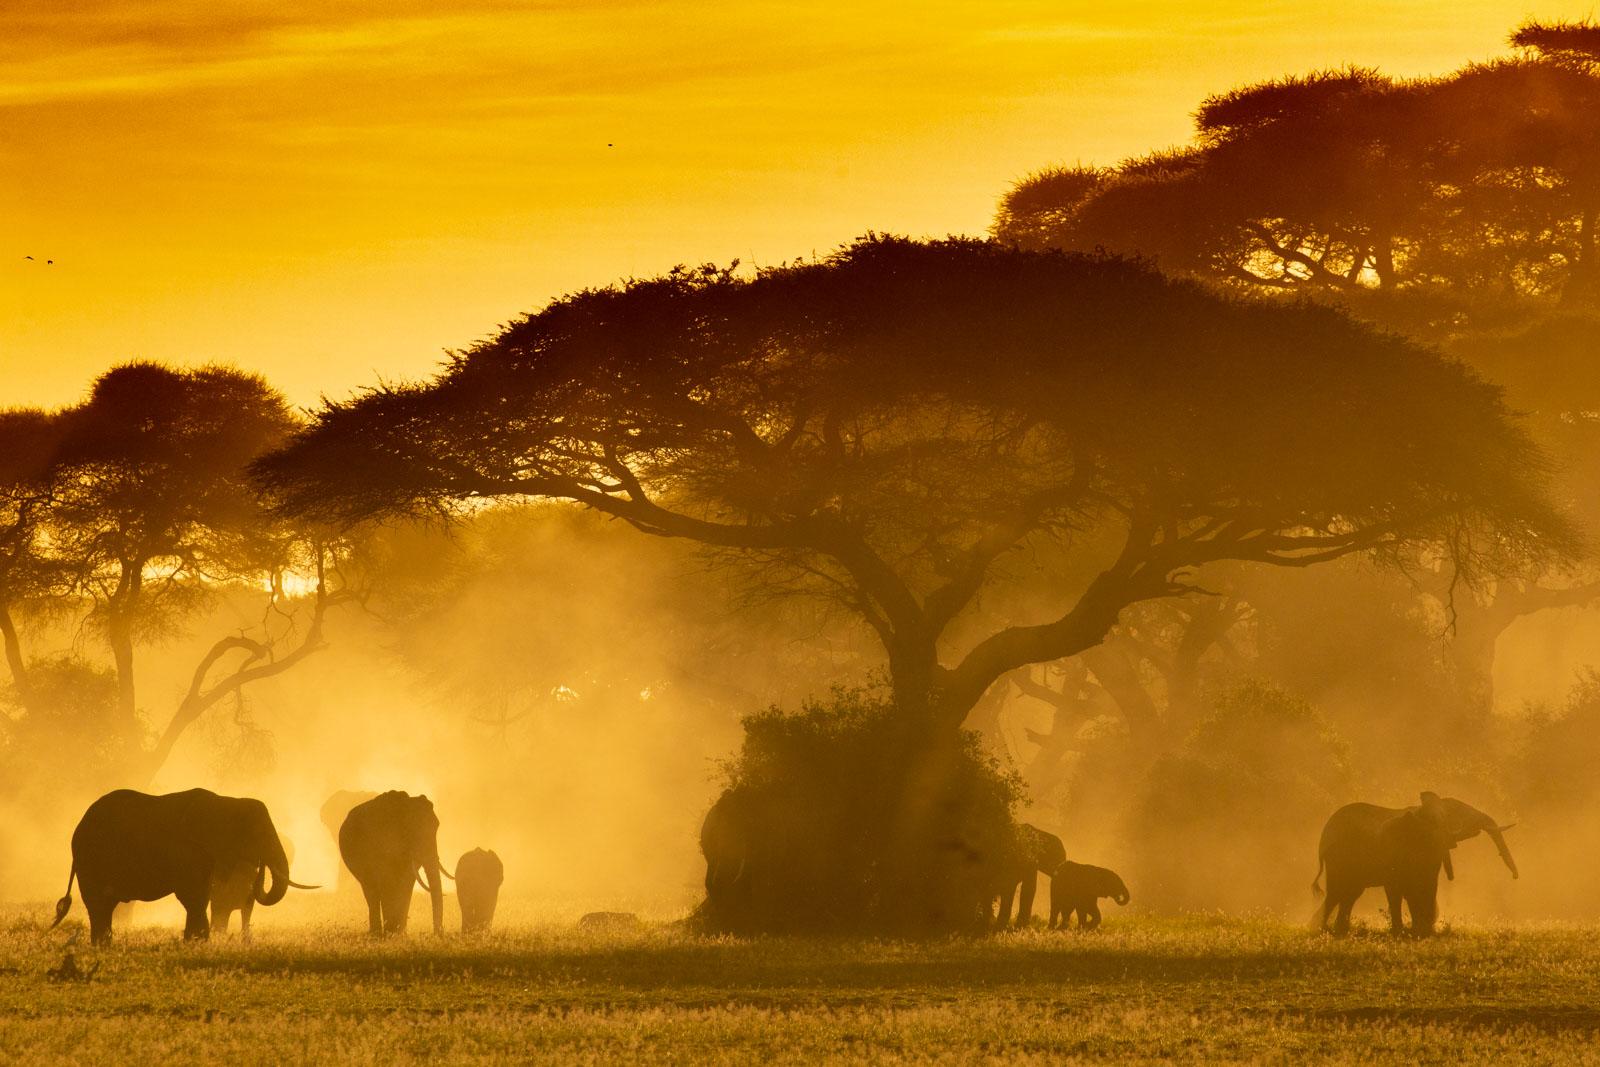 Elephants backlit